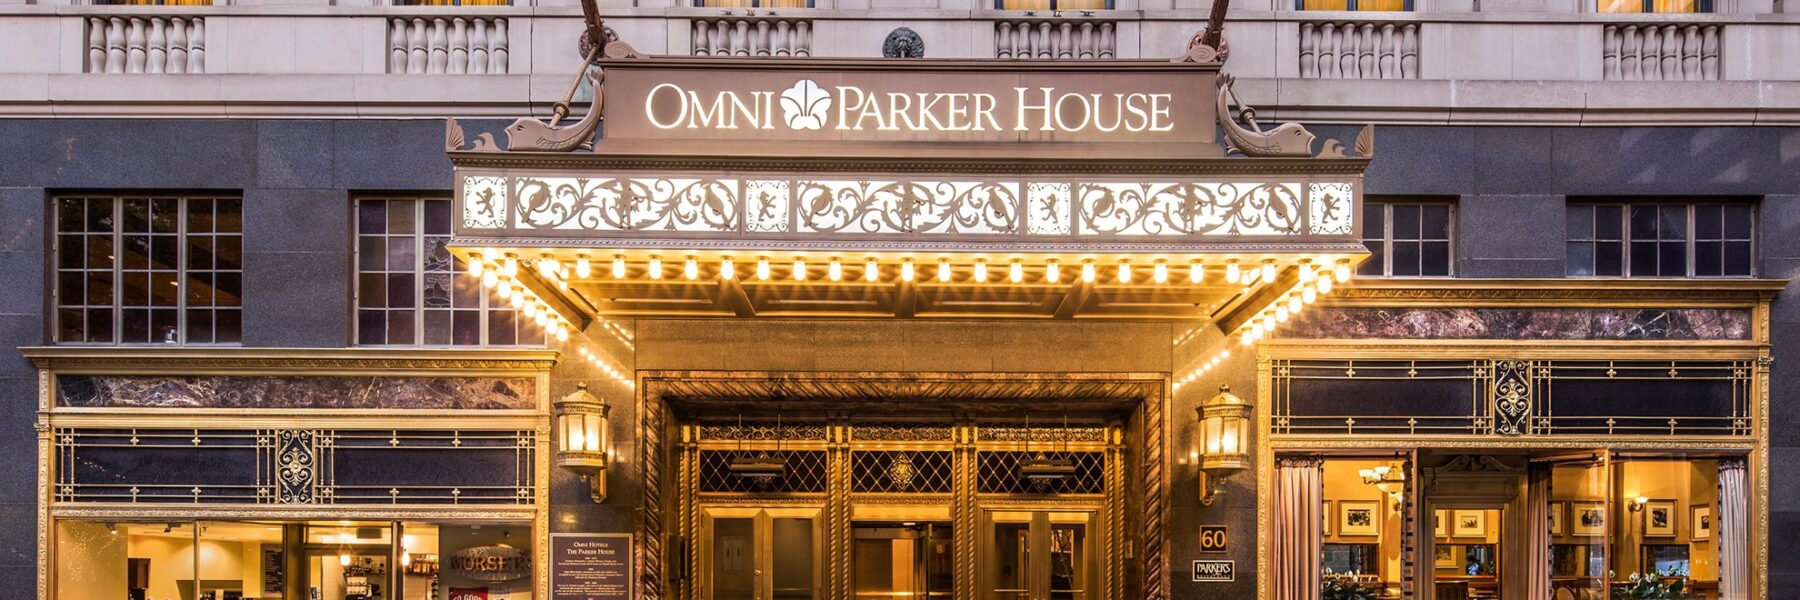 boston hotel omni parker house